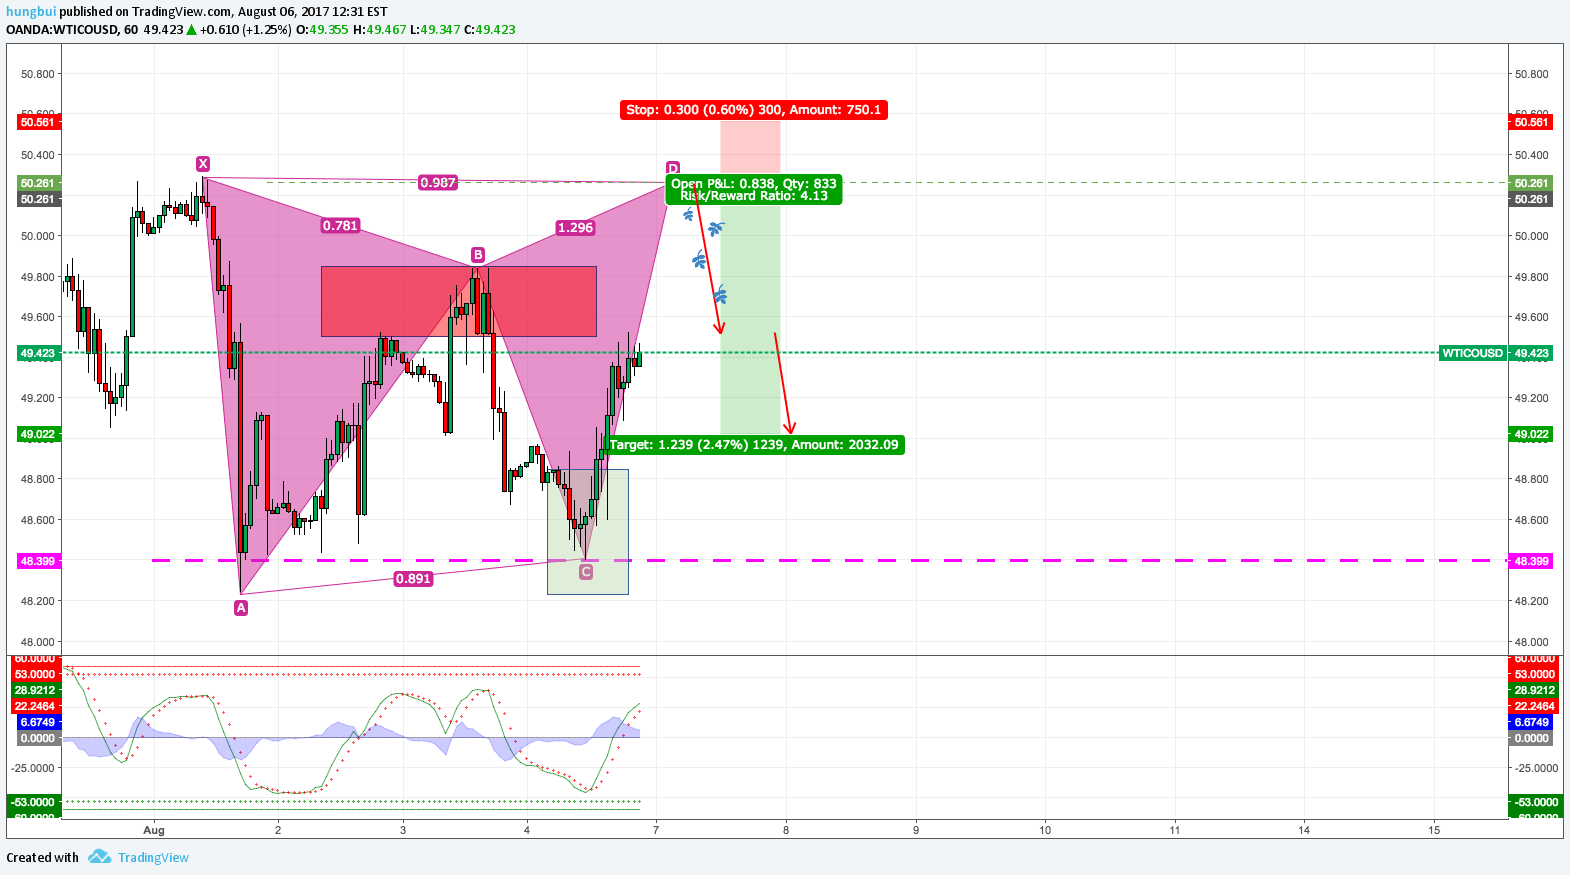 Gartley pattern trading - Practice mode only for OANDA